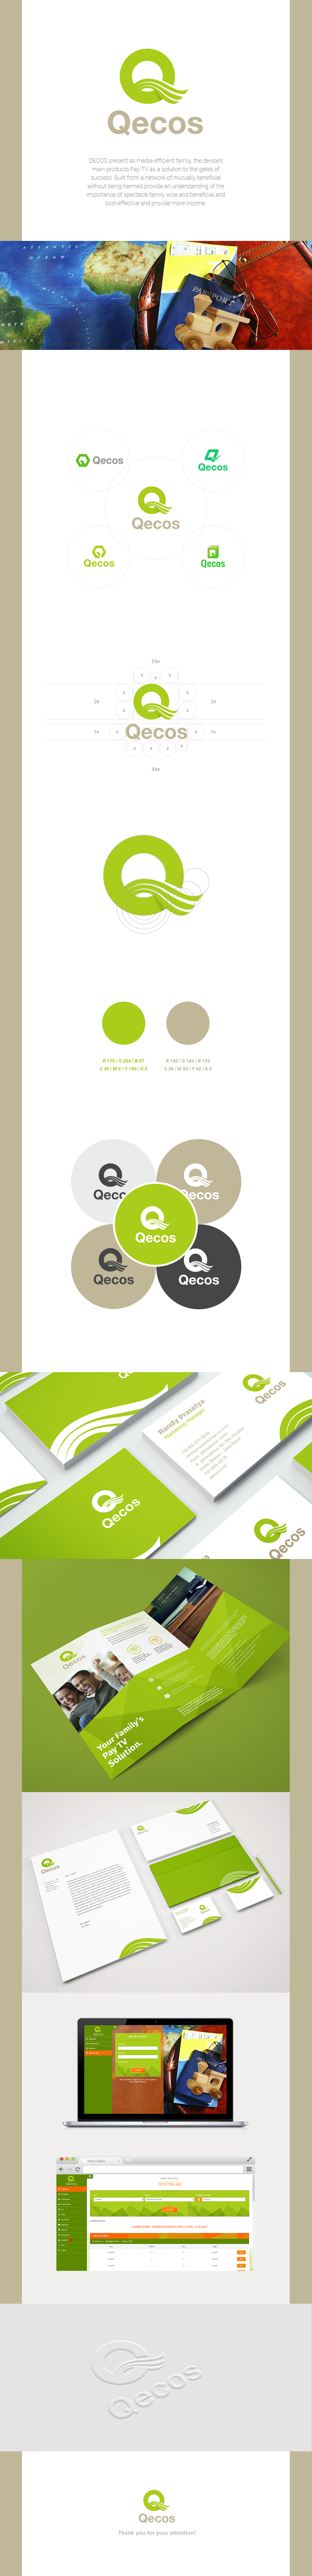 Qecos graphic